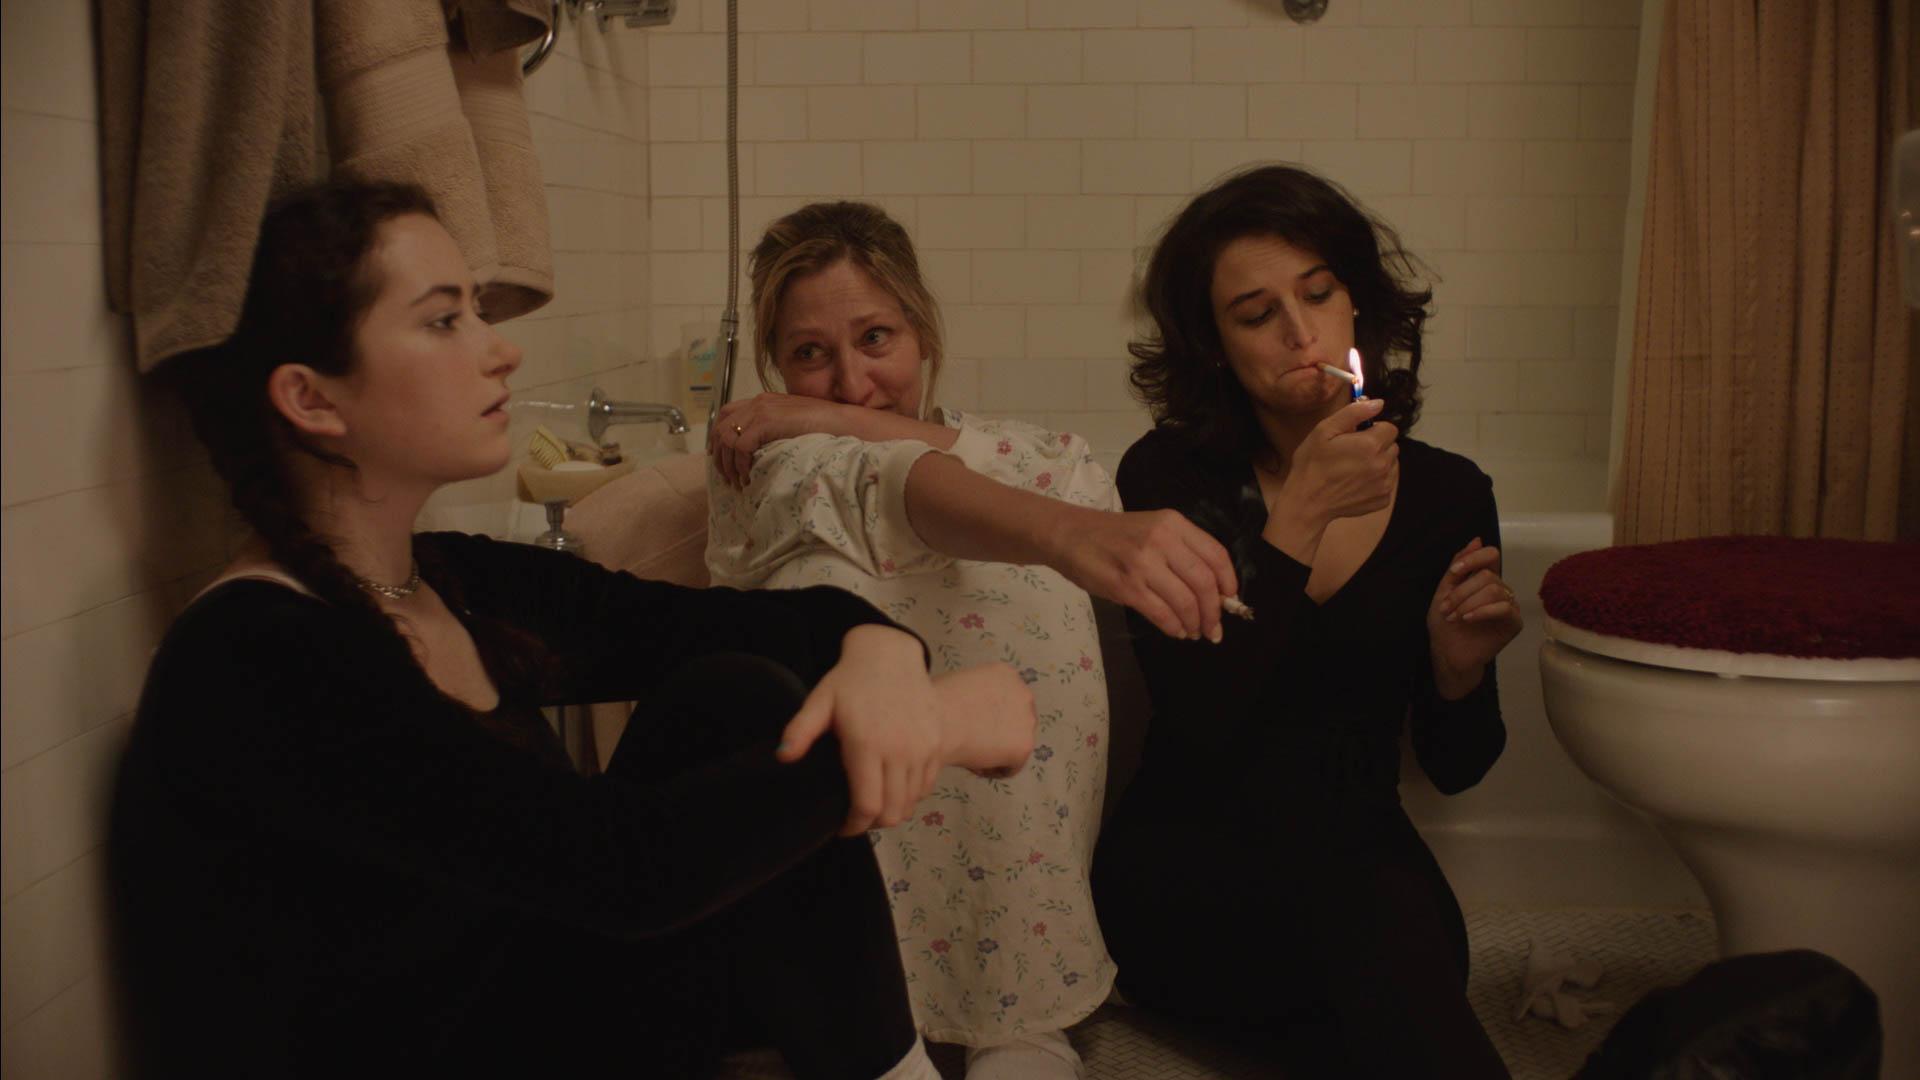 ALL CROPS: Sundance: Edie Falco, Jenny Slate in LANDLINE